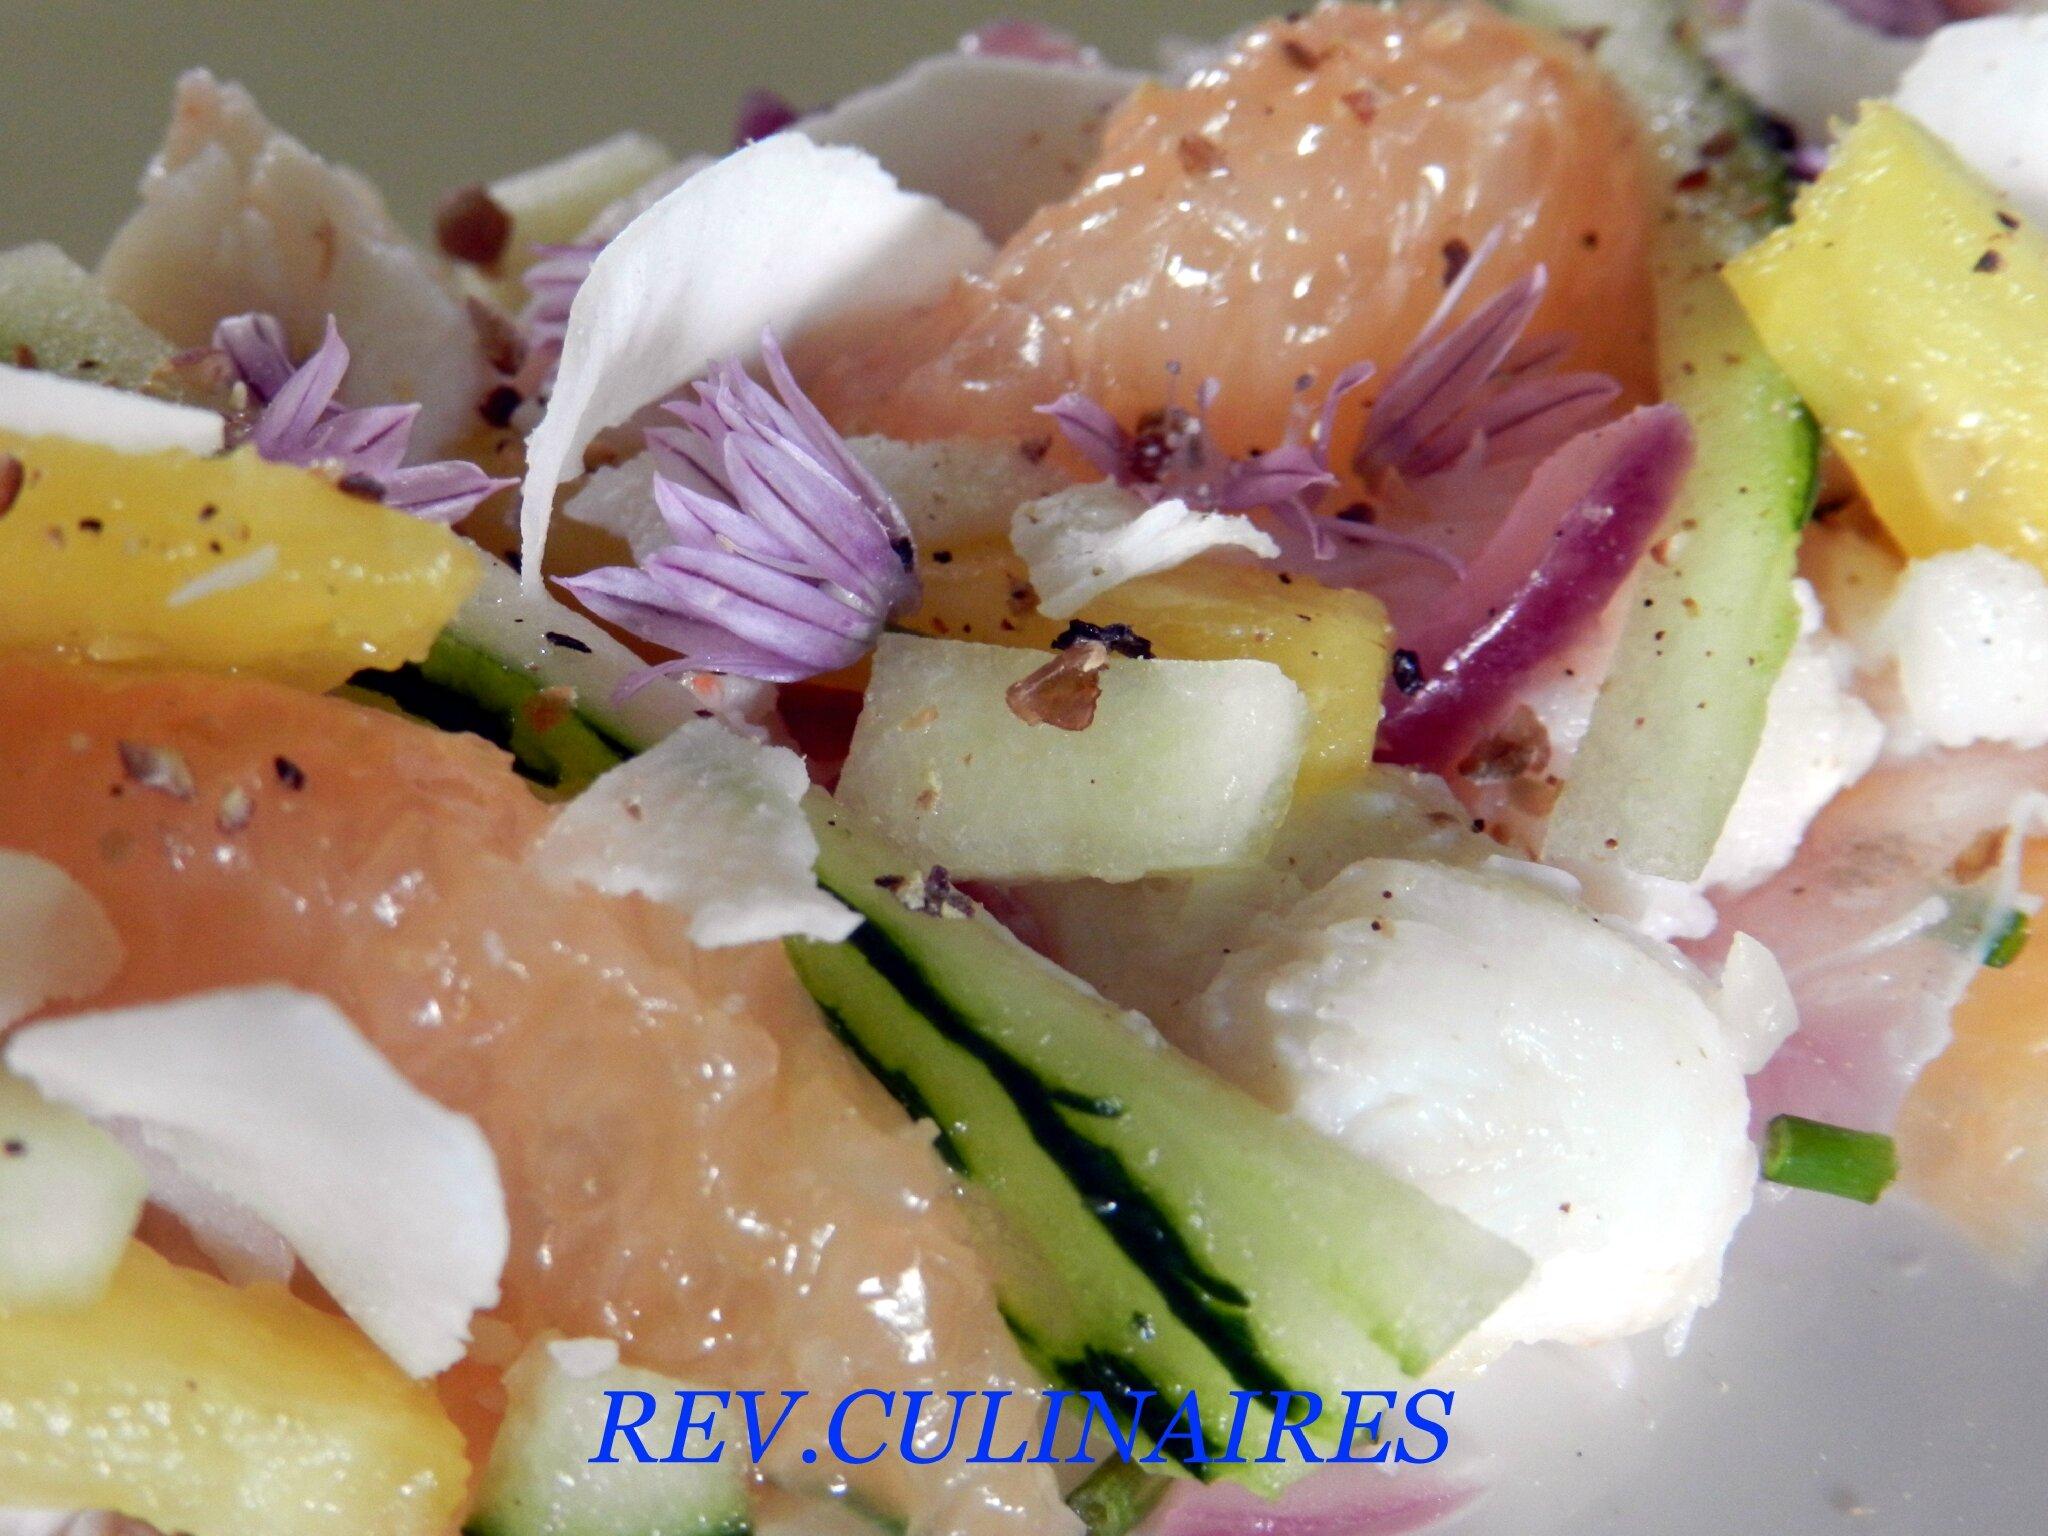 salade exotique de crabe, rapée de coco 2